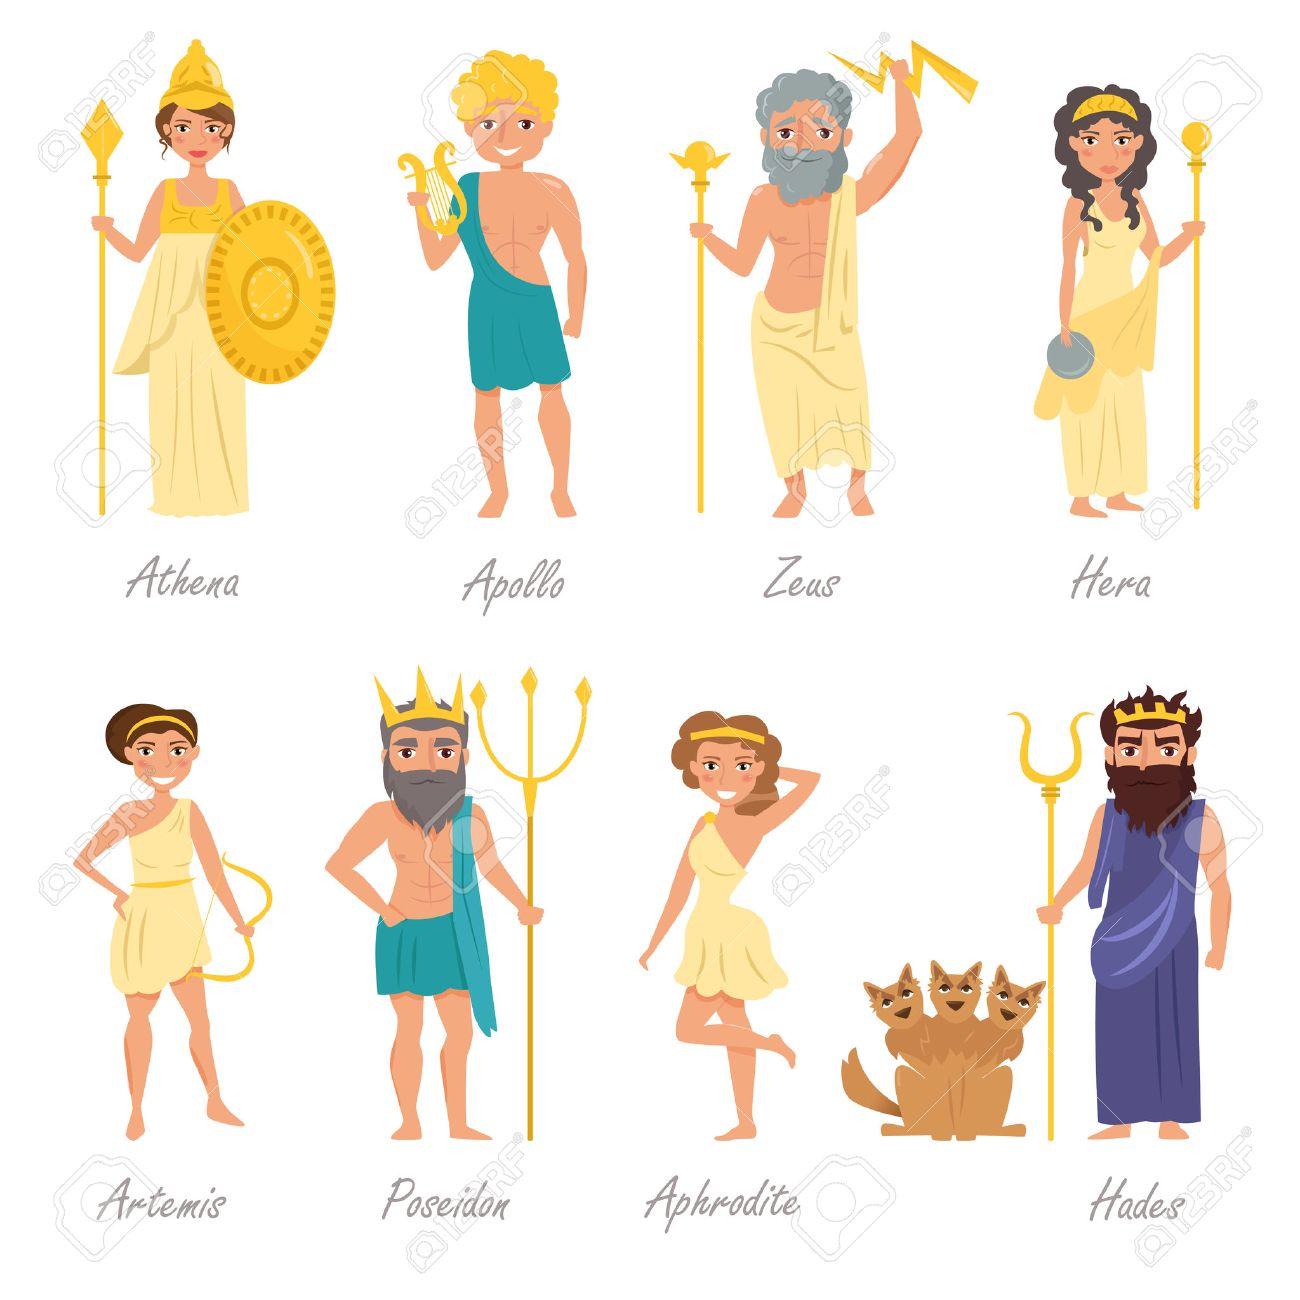 greek gods artemis poseidon aphrodite hades hera apollo rh 123rf com hera pheri cartoon hera cartoon picture